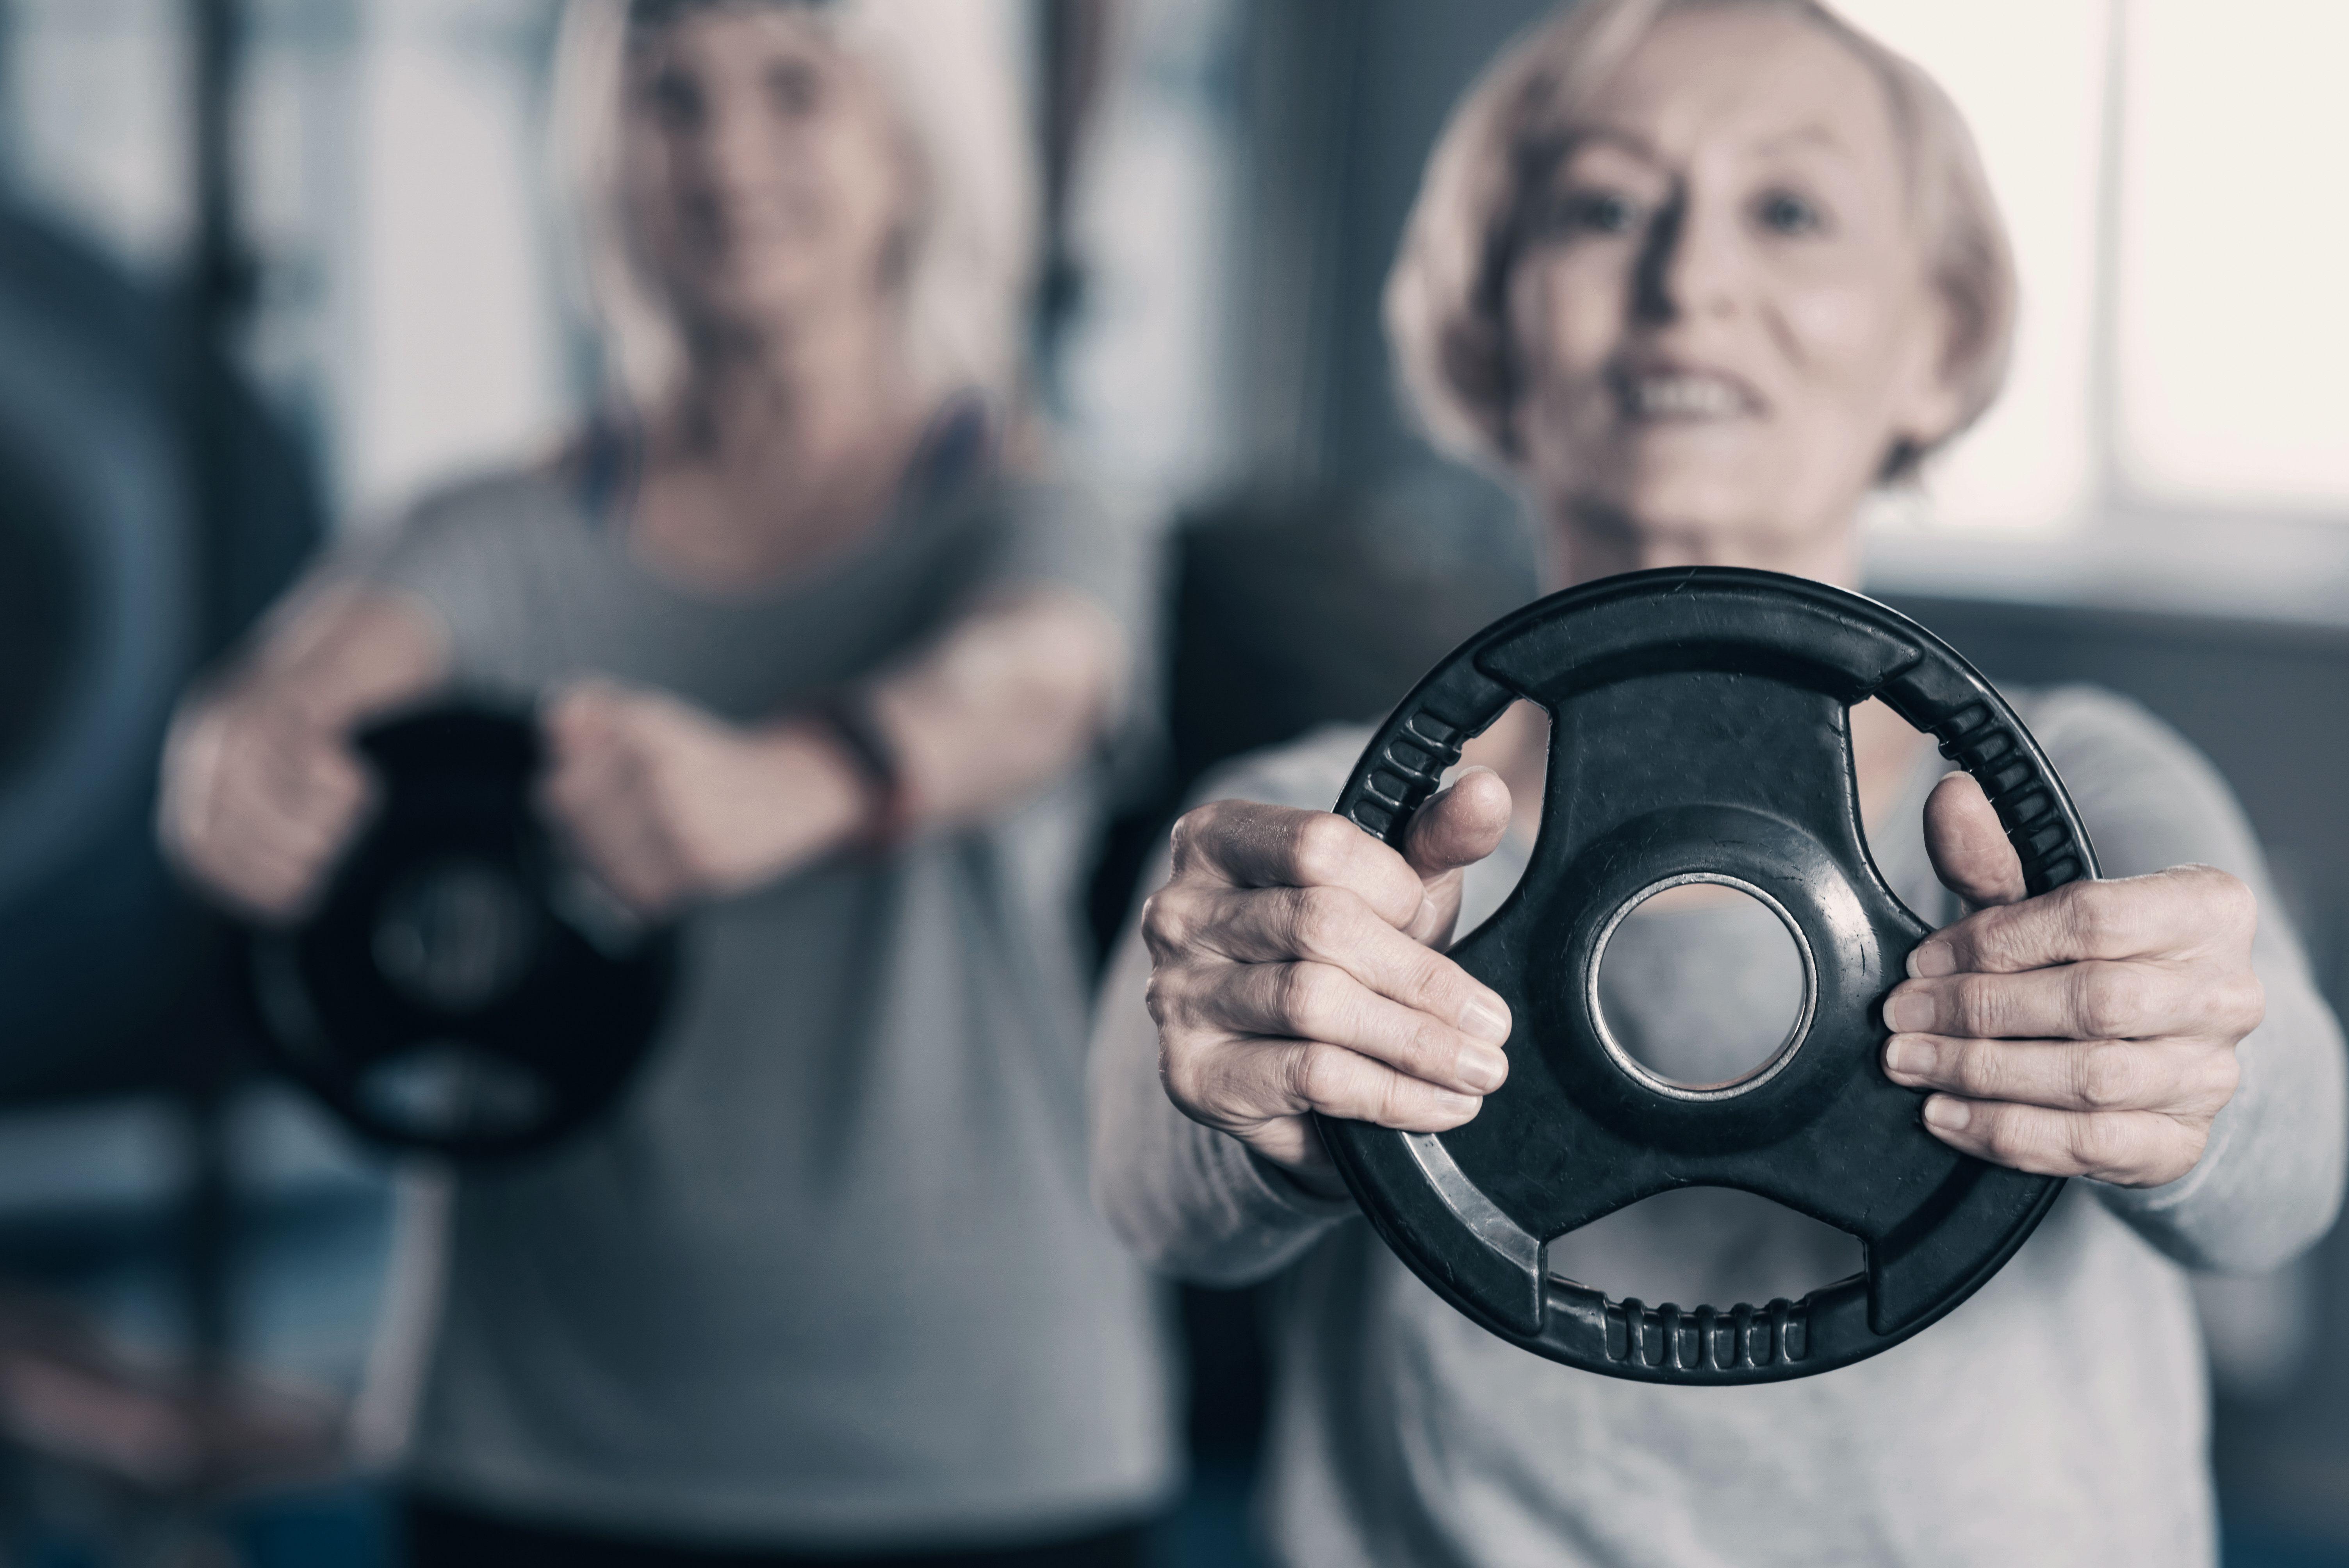 senior womann lifting wieght 1